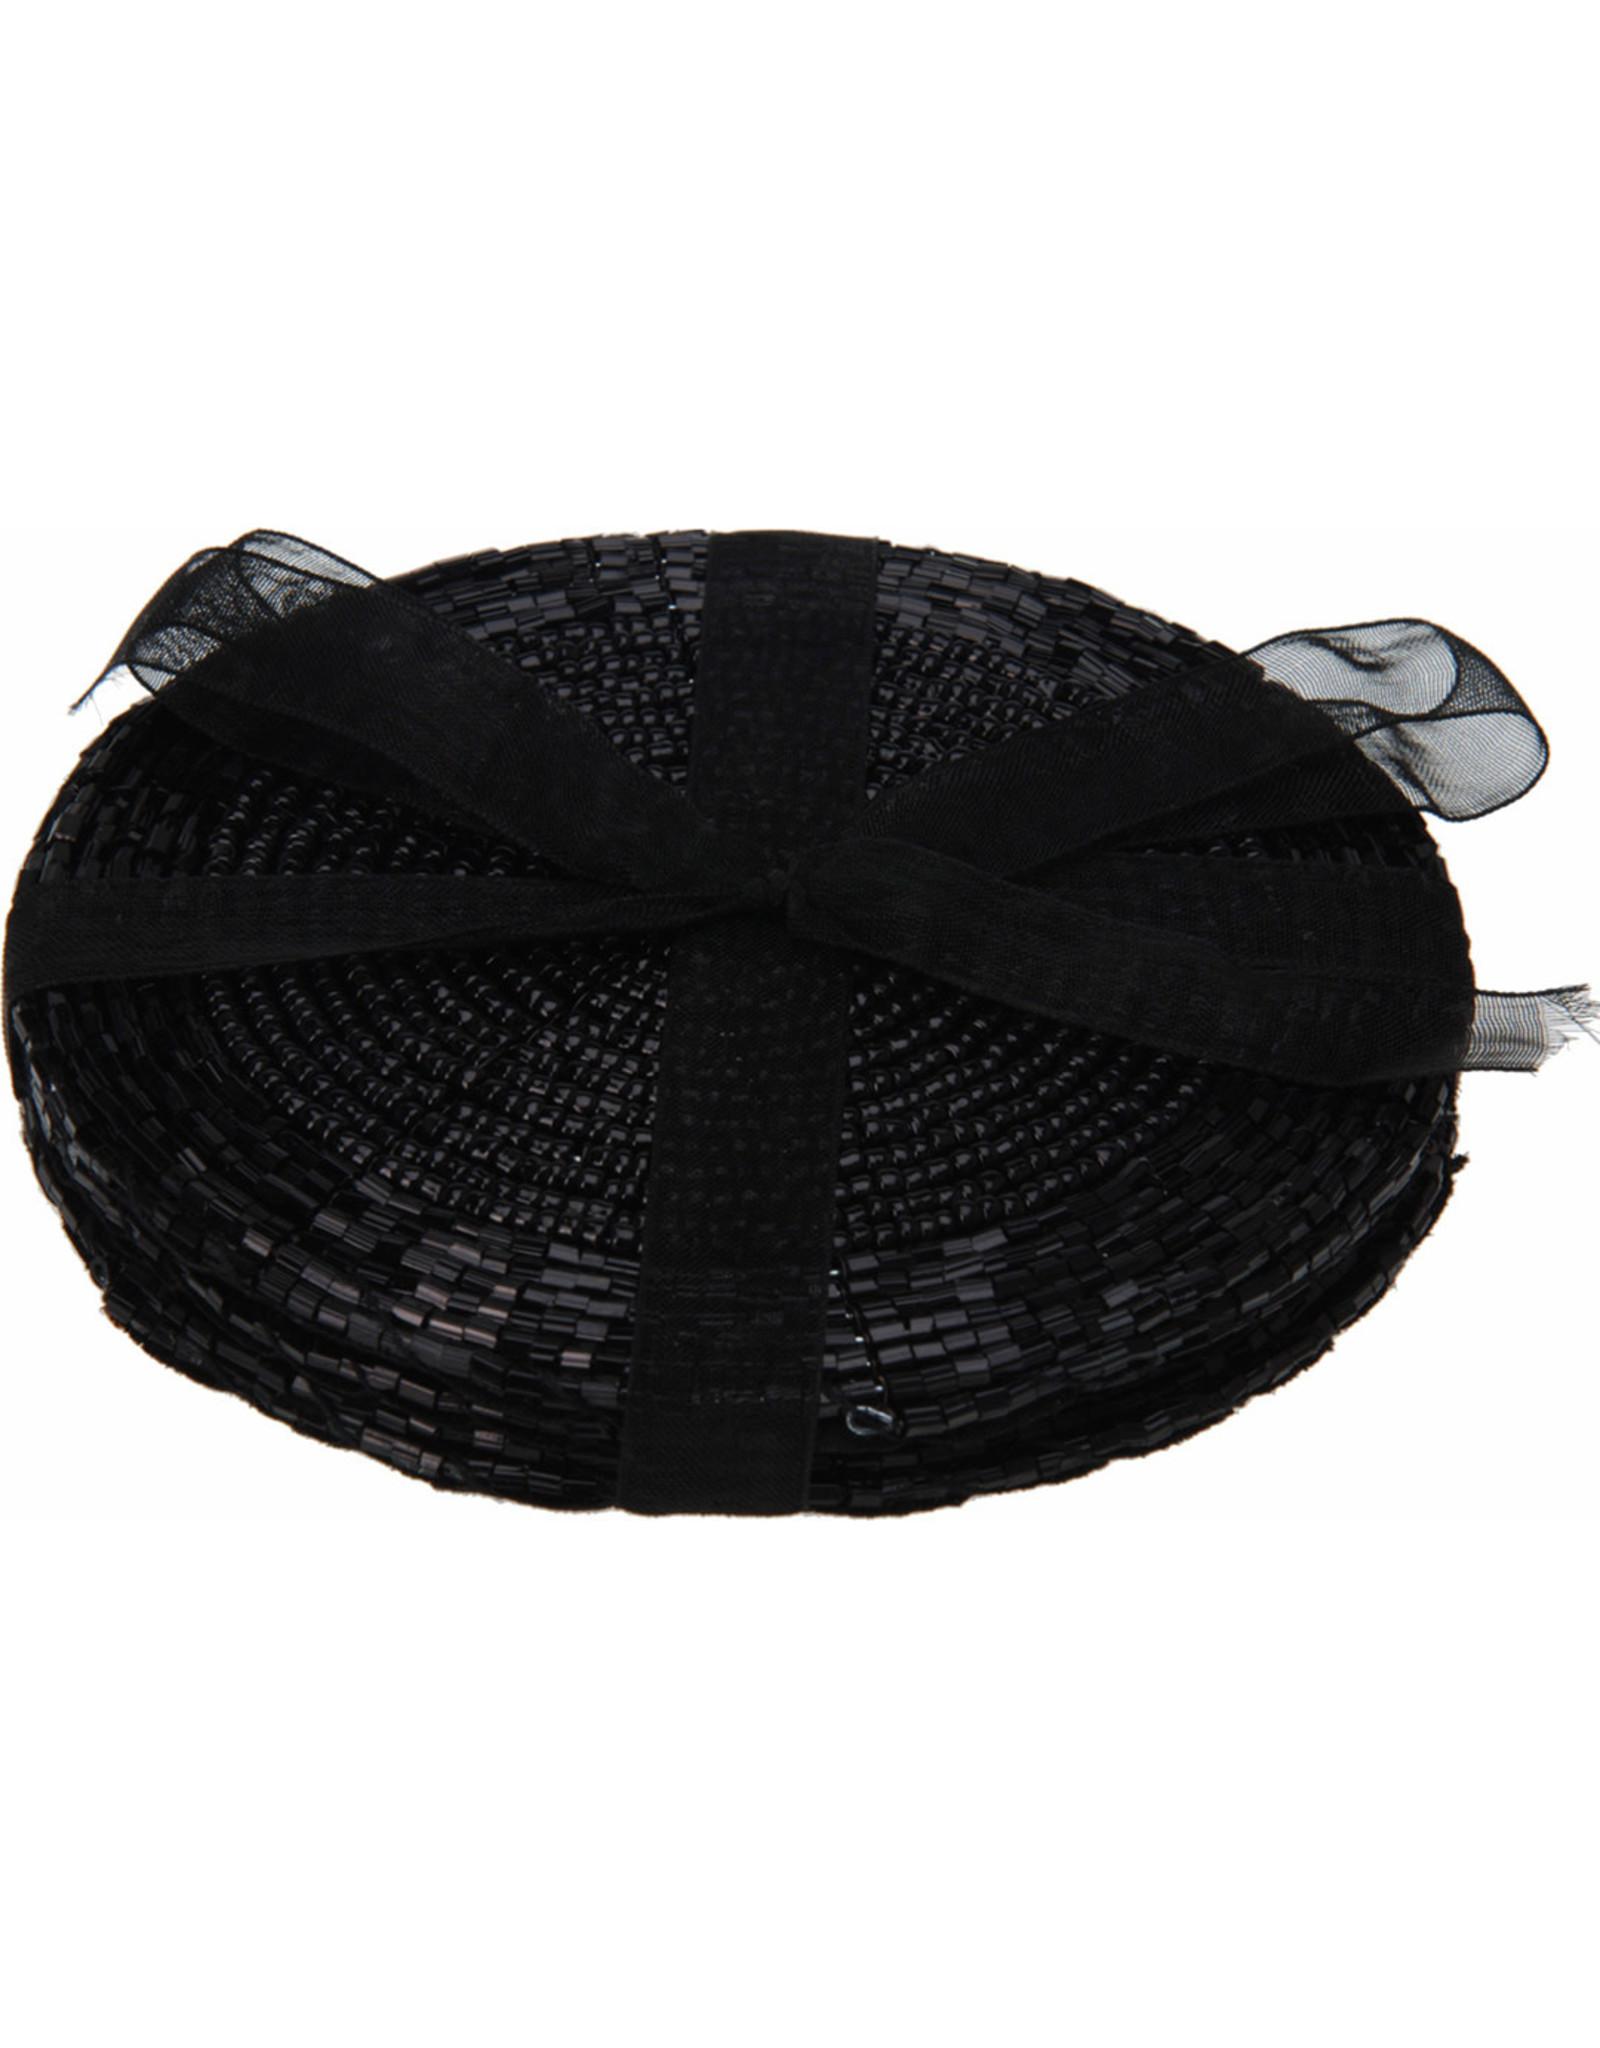 Koopman Coaster Set Beaded 4Pcs Black